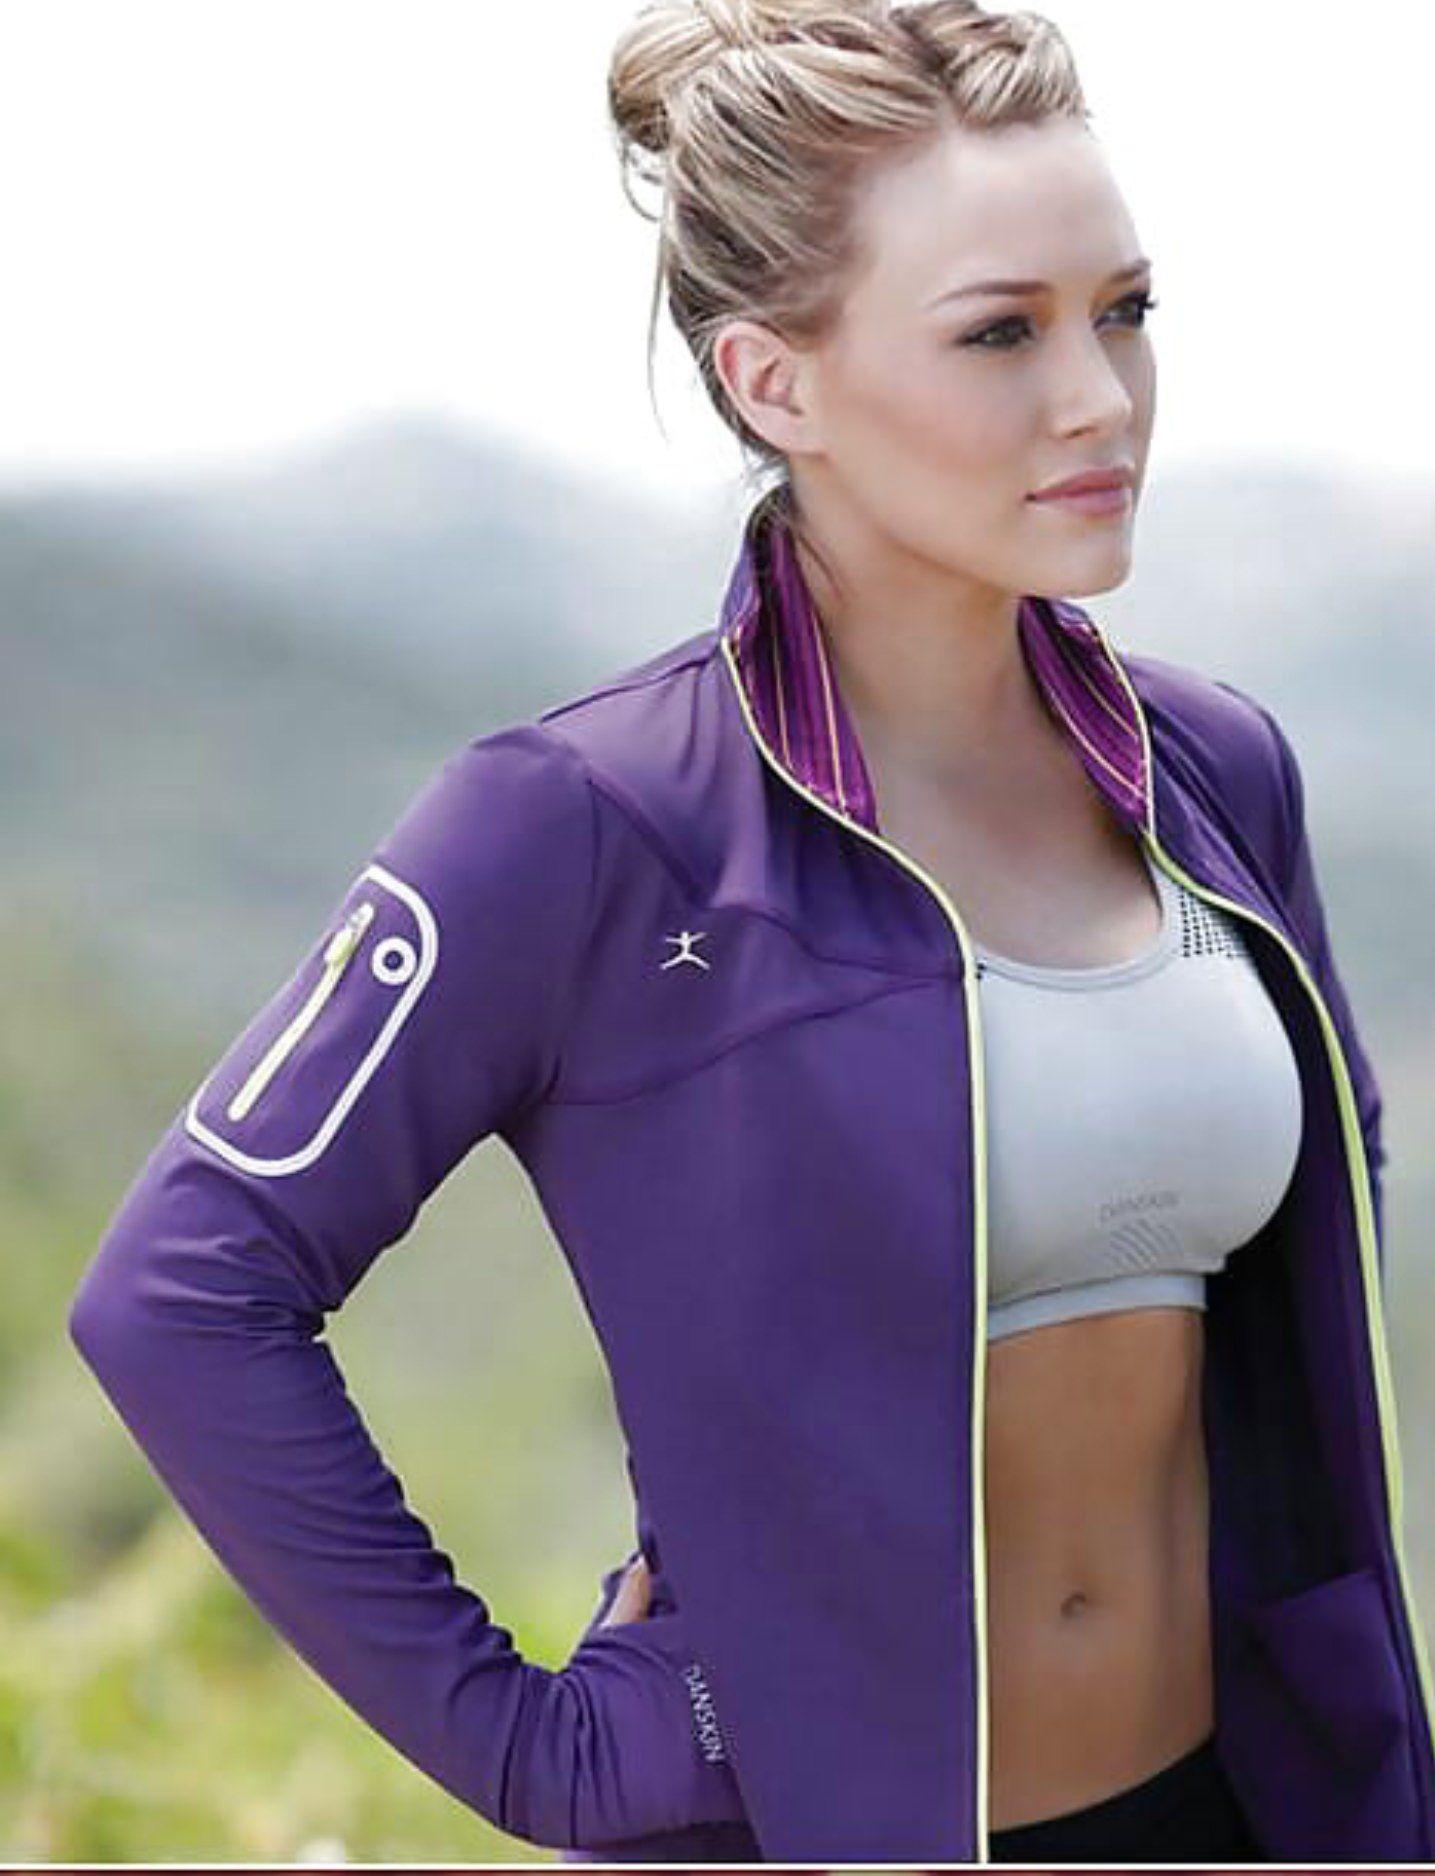 Endsville hillary duff beautiful in pinterest fitness